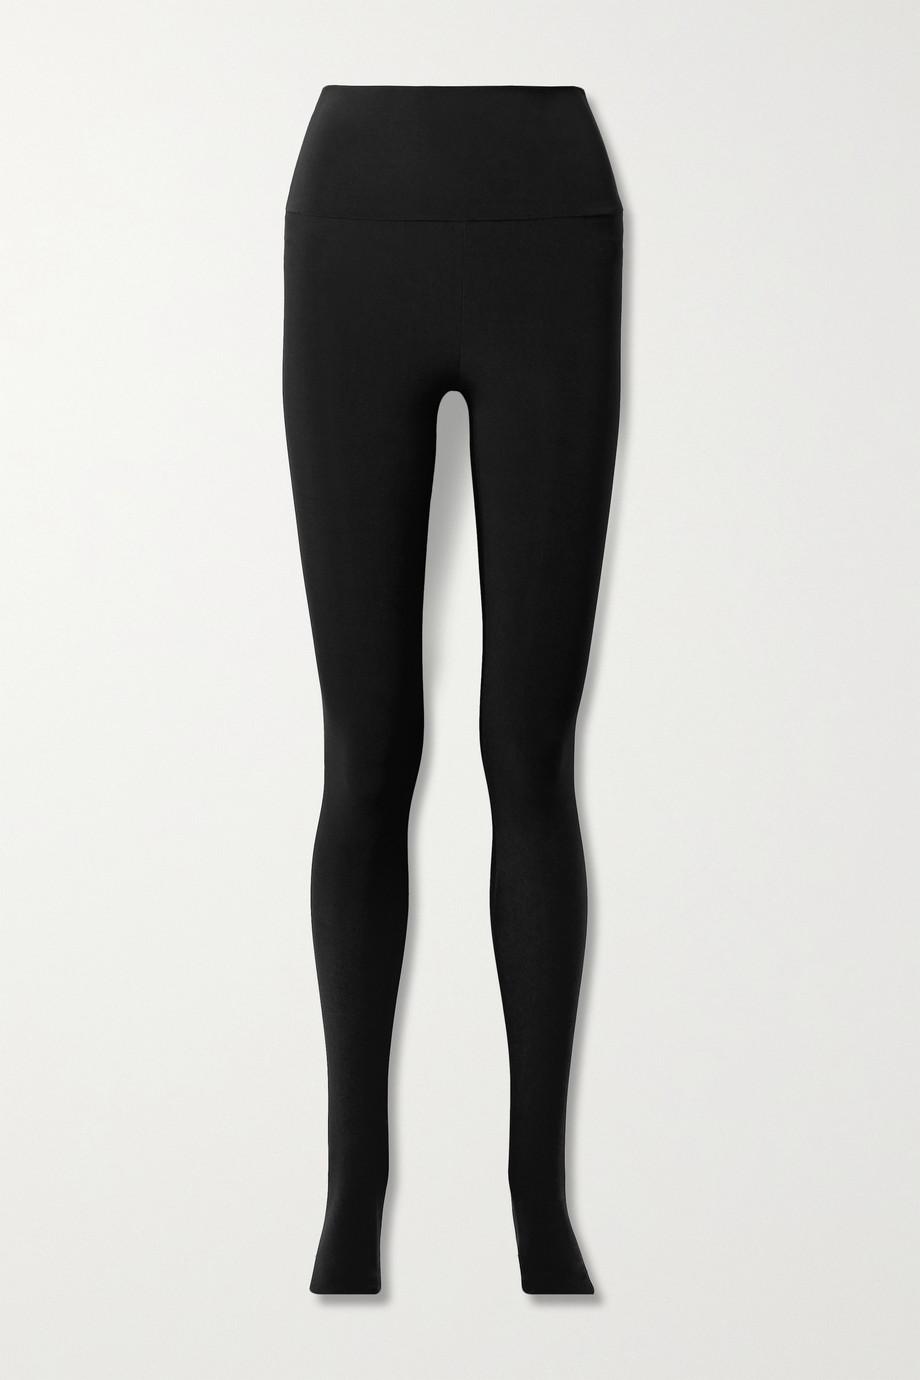 Norma Kamali Stretch-jersey stirrup leggings